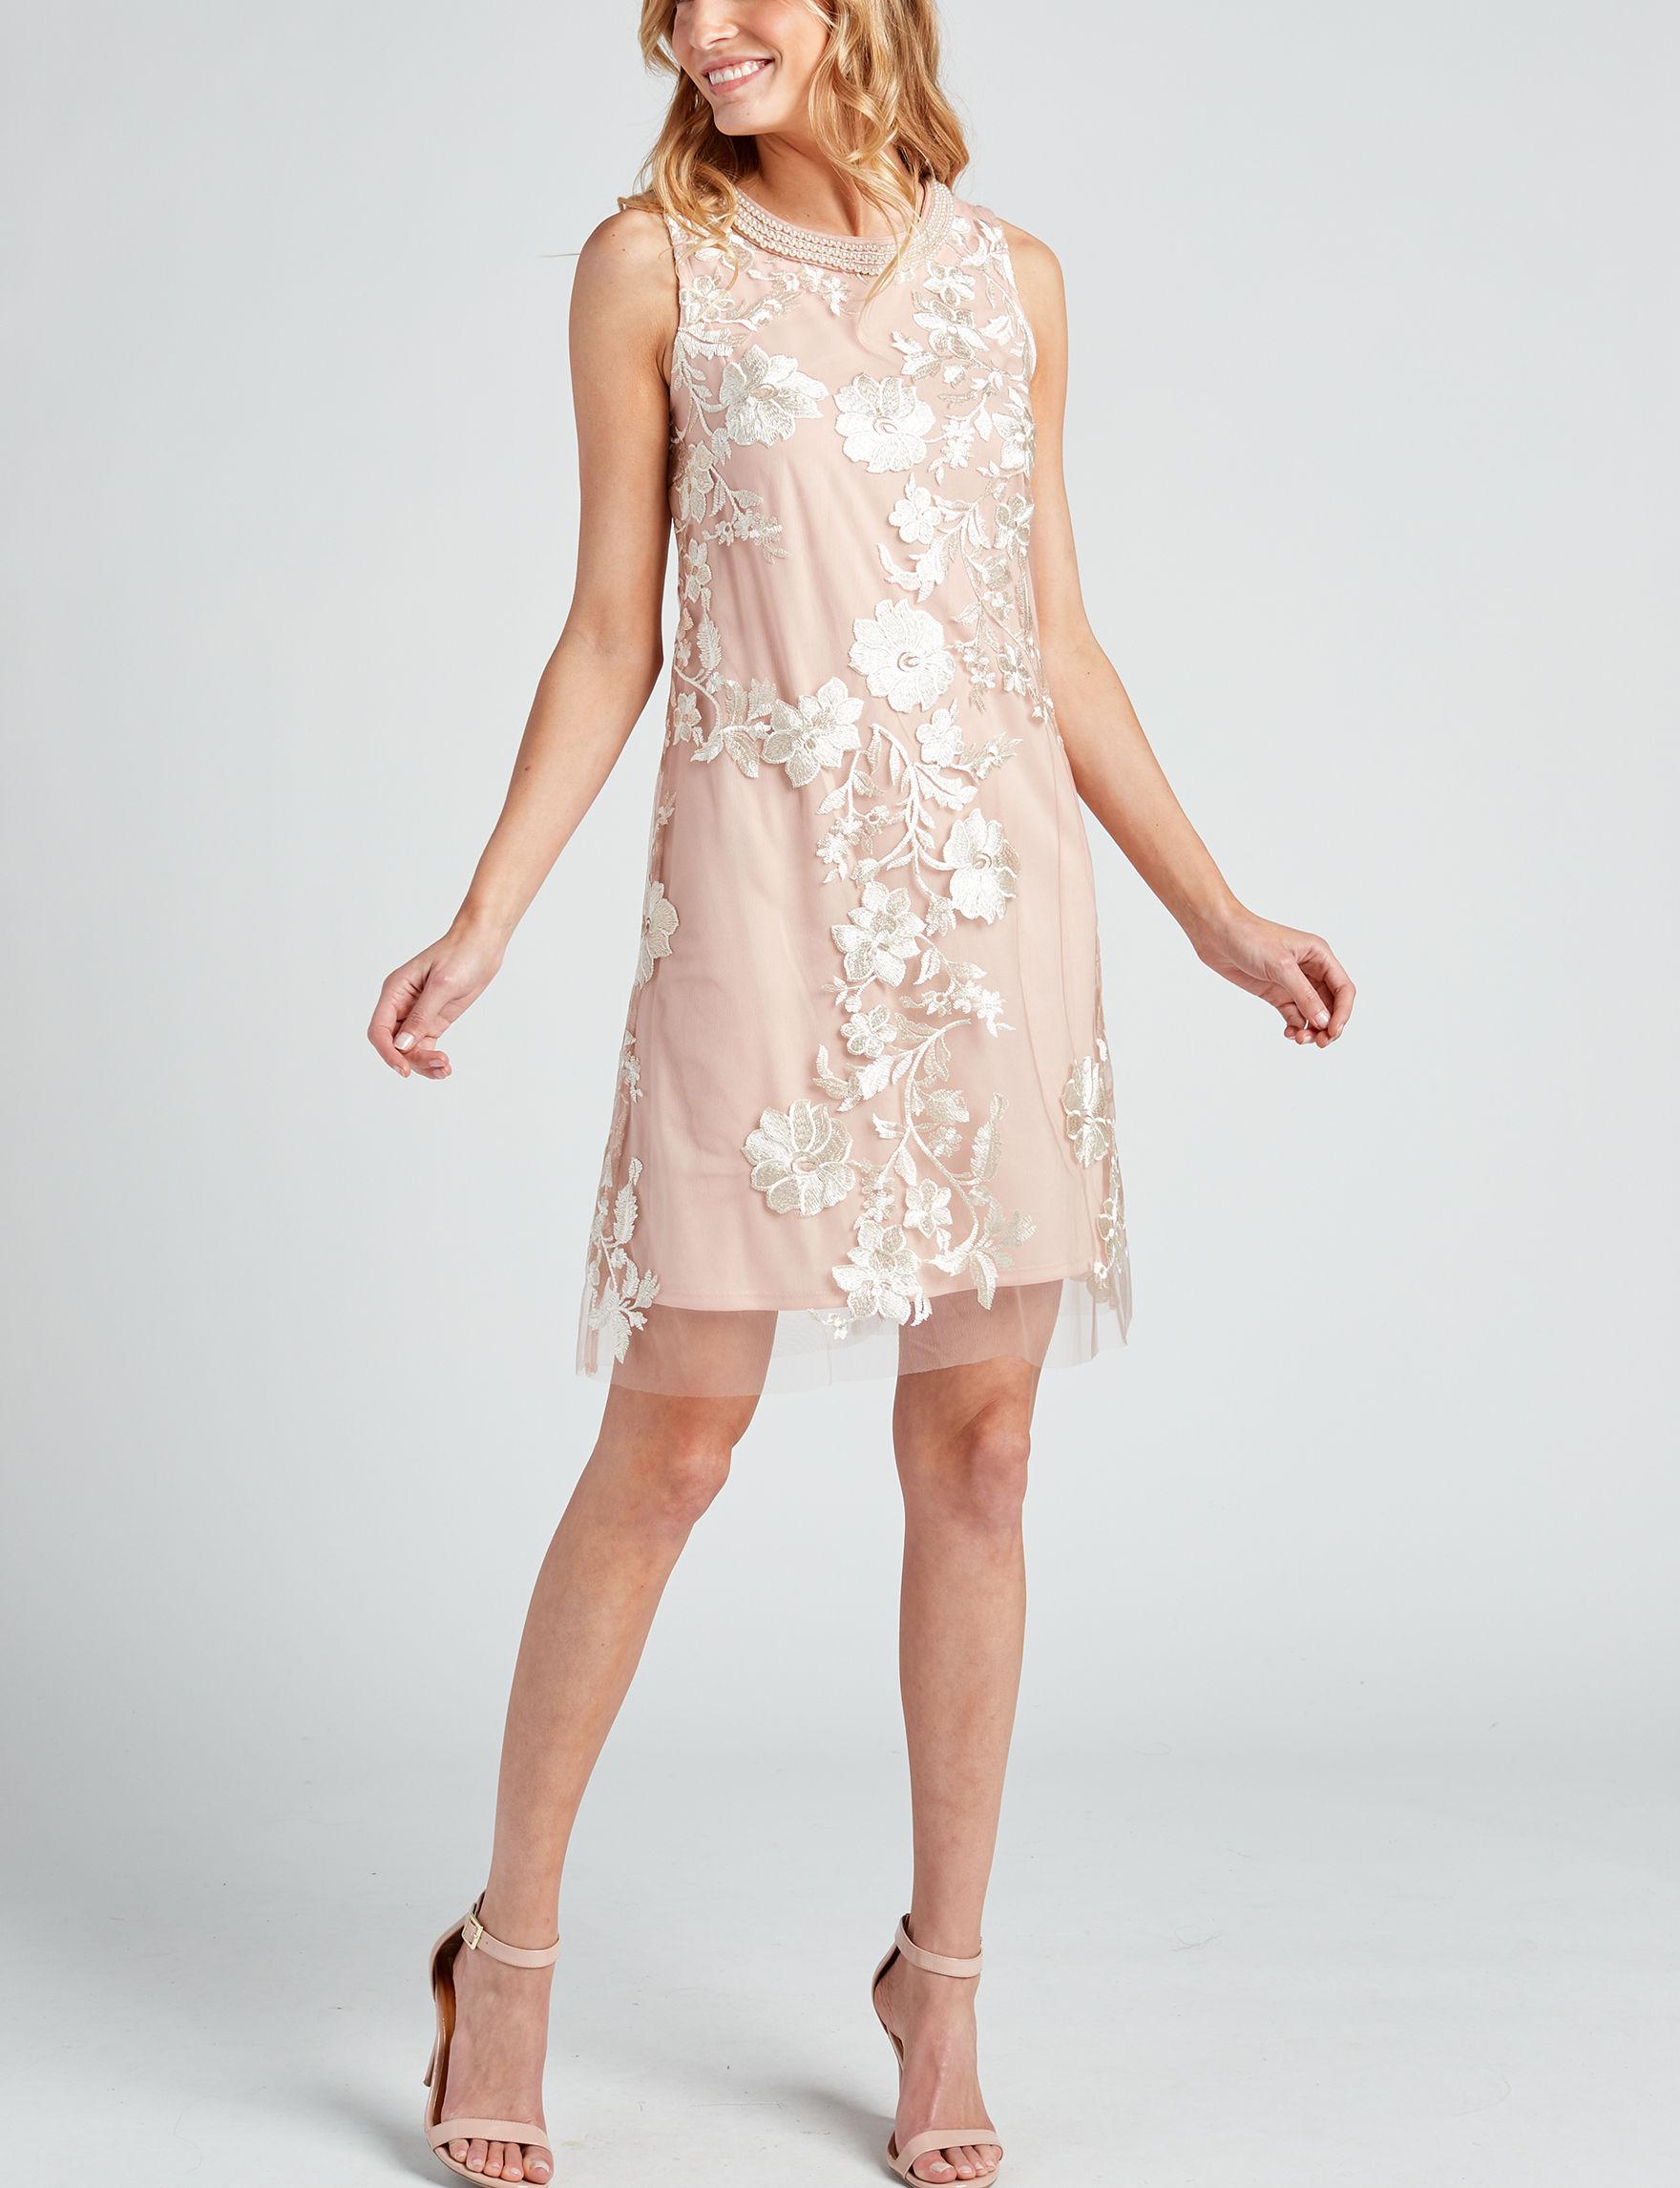 Sandra Darren Light Pink Cocktail & Party Evening & Formal Shift Dresses